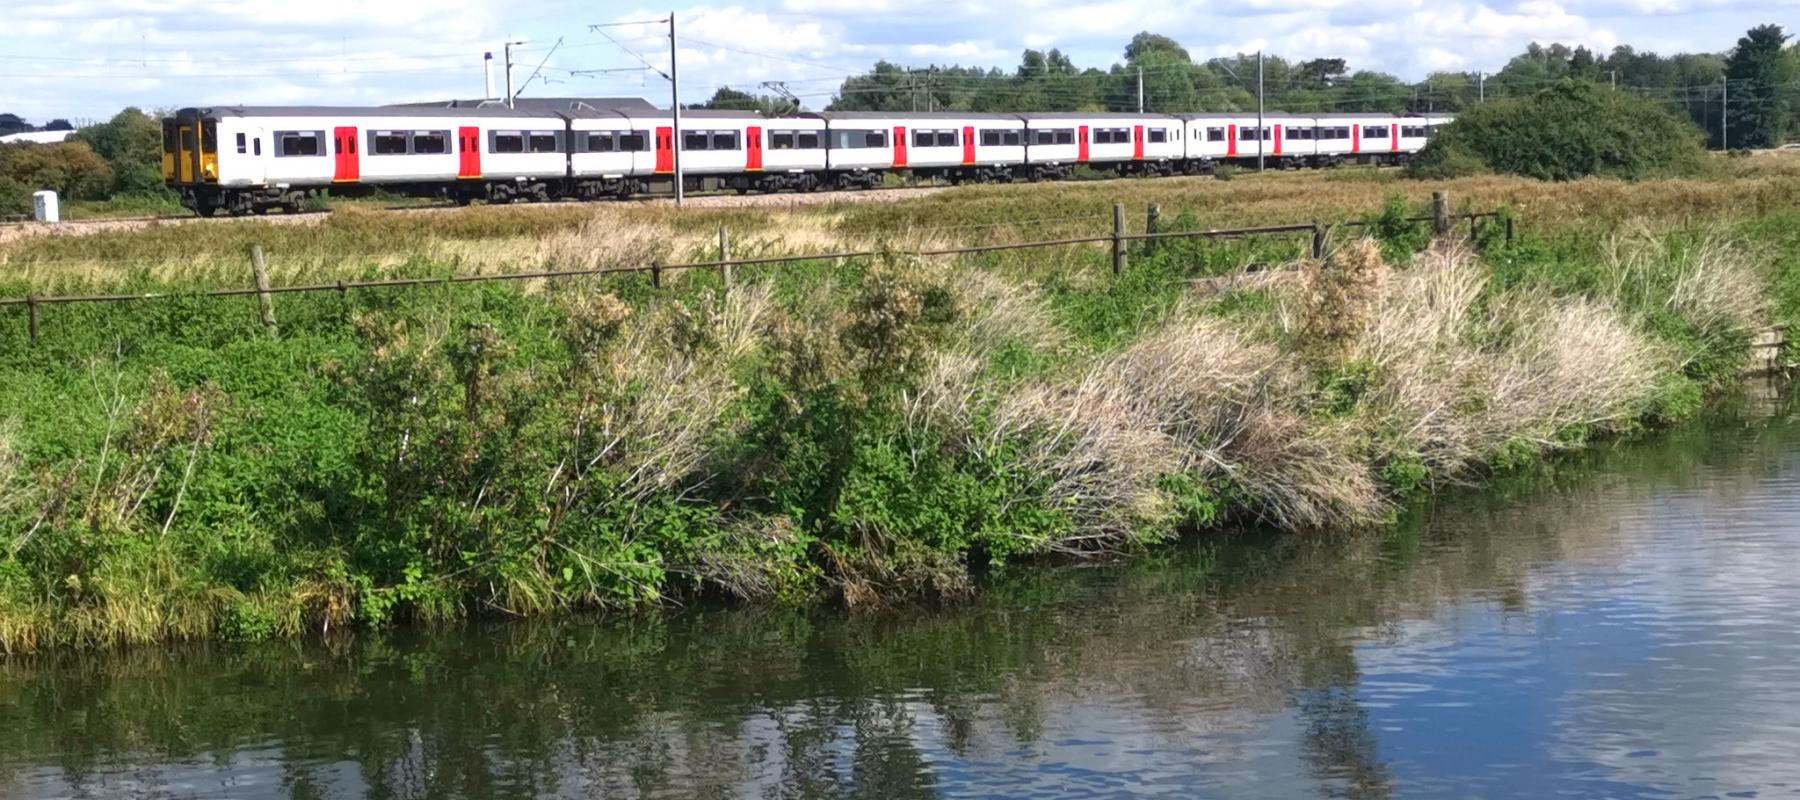 A train running alongside the New River Path near Hertford East